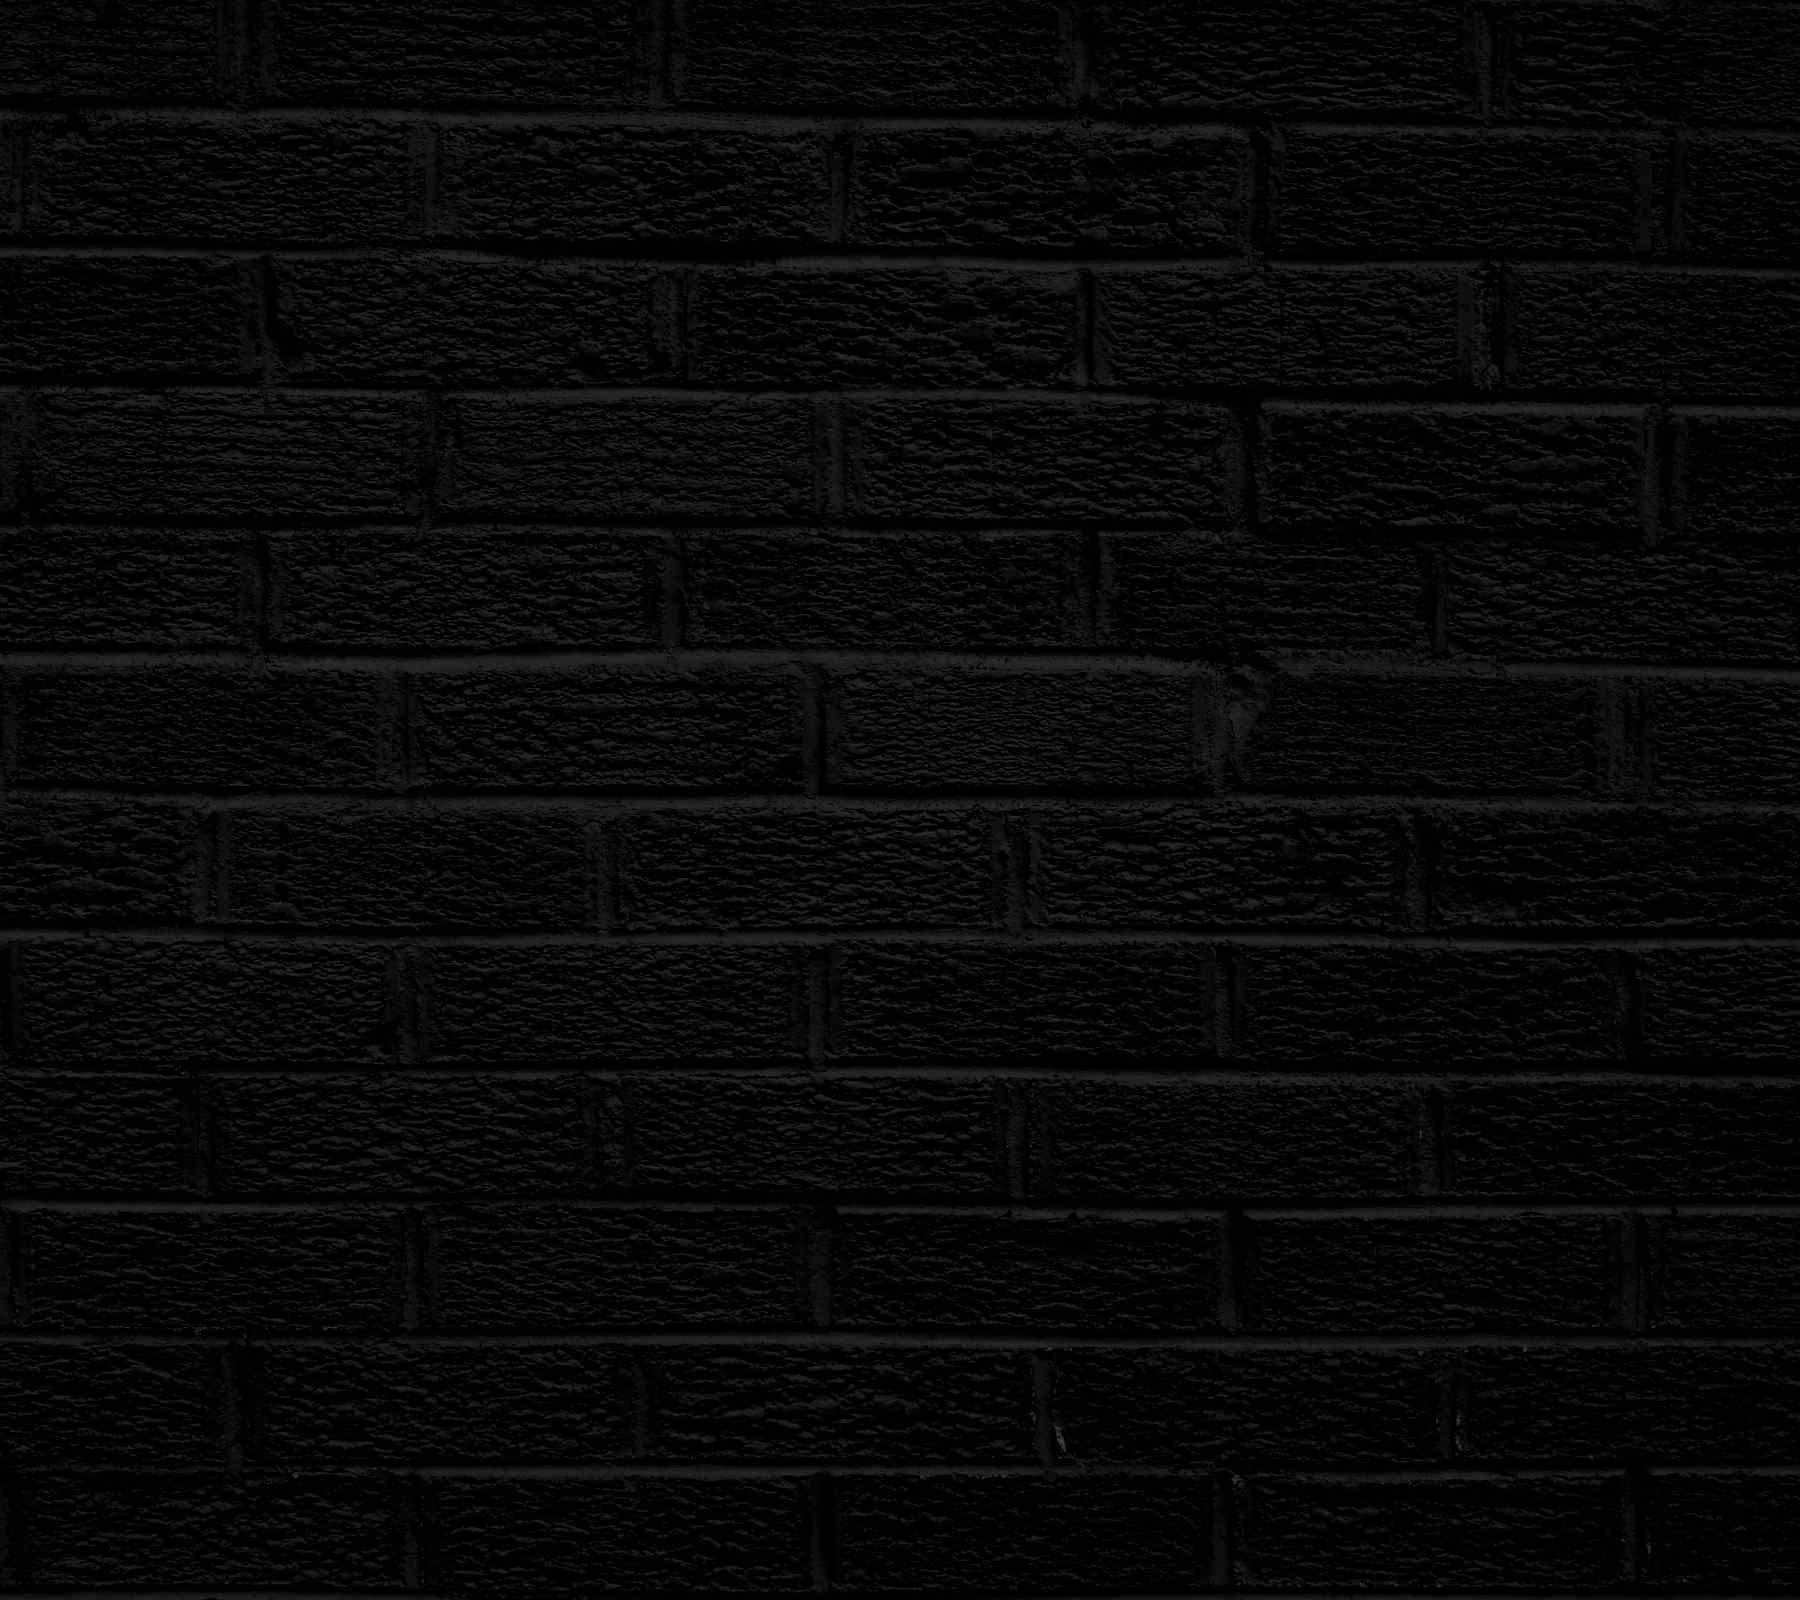 Black Brick Wall Walls Fractals Dark Wallpaper Bricks Gifs Wallpapers Cases Photography